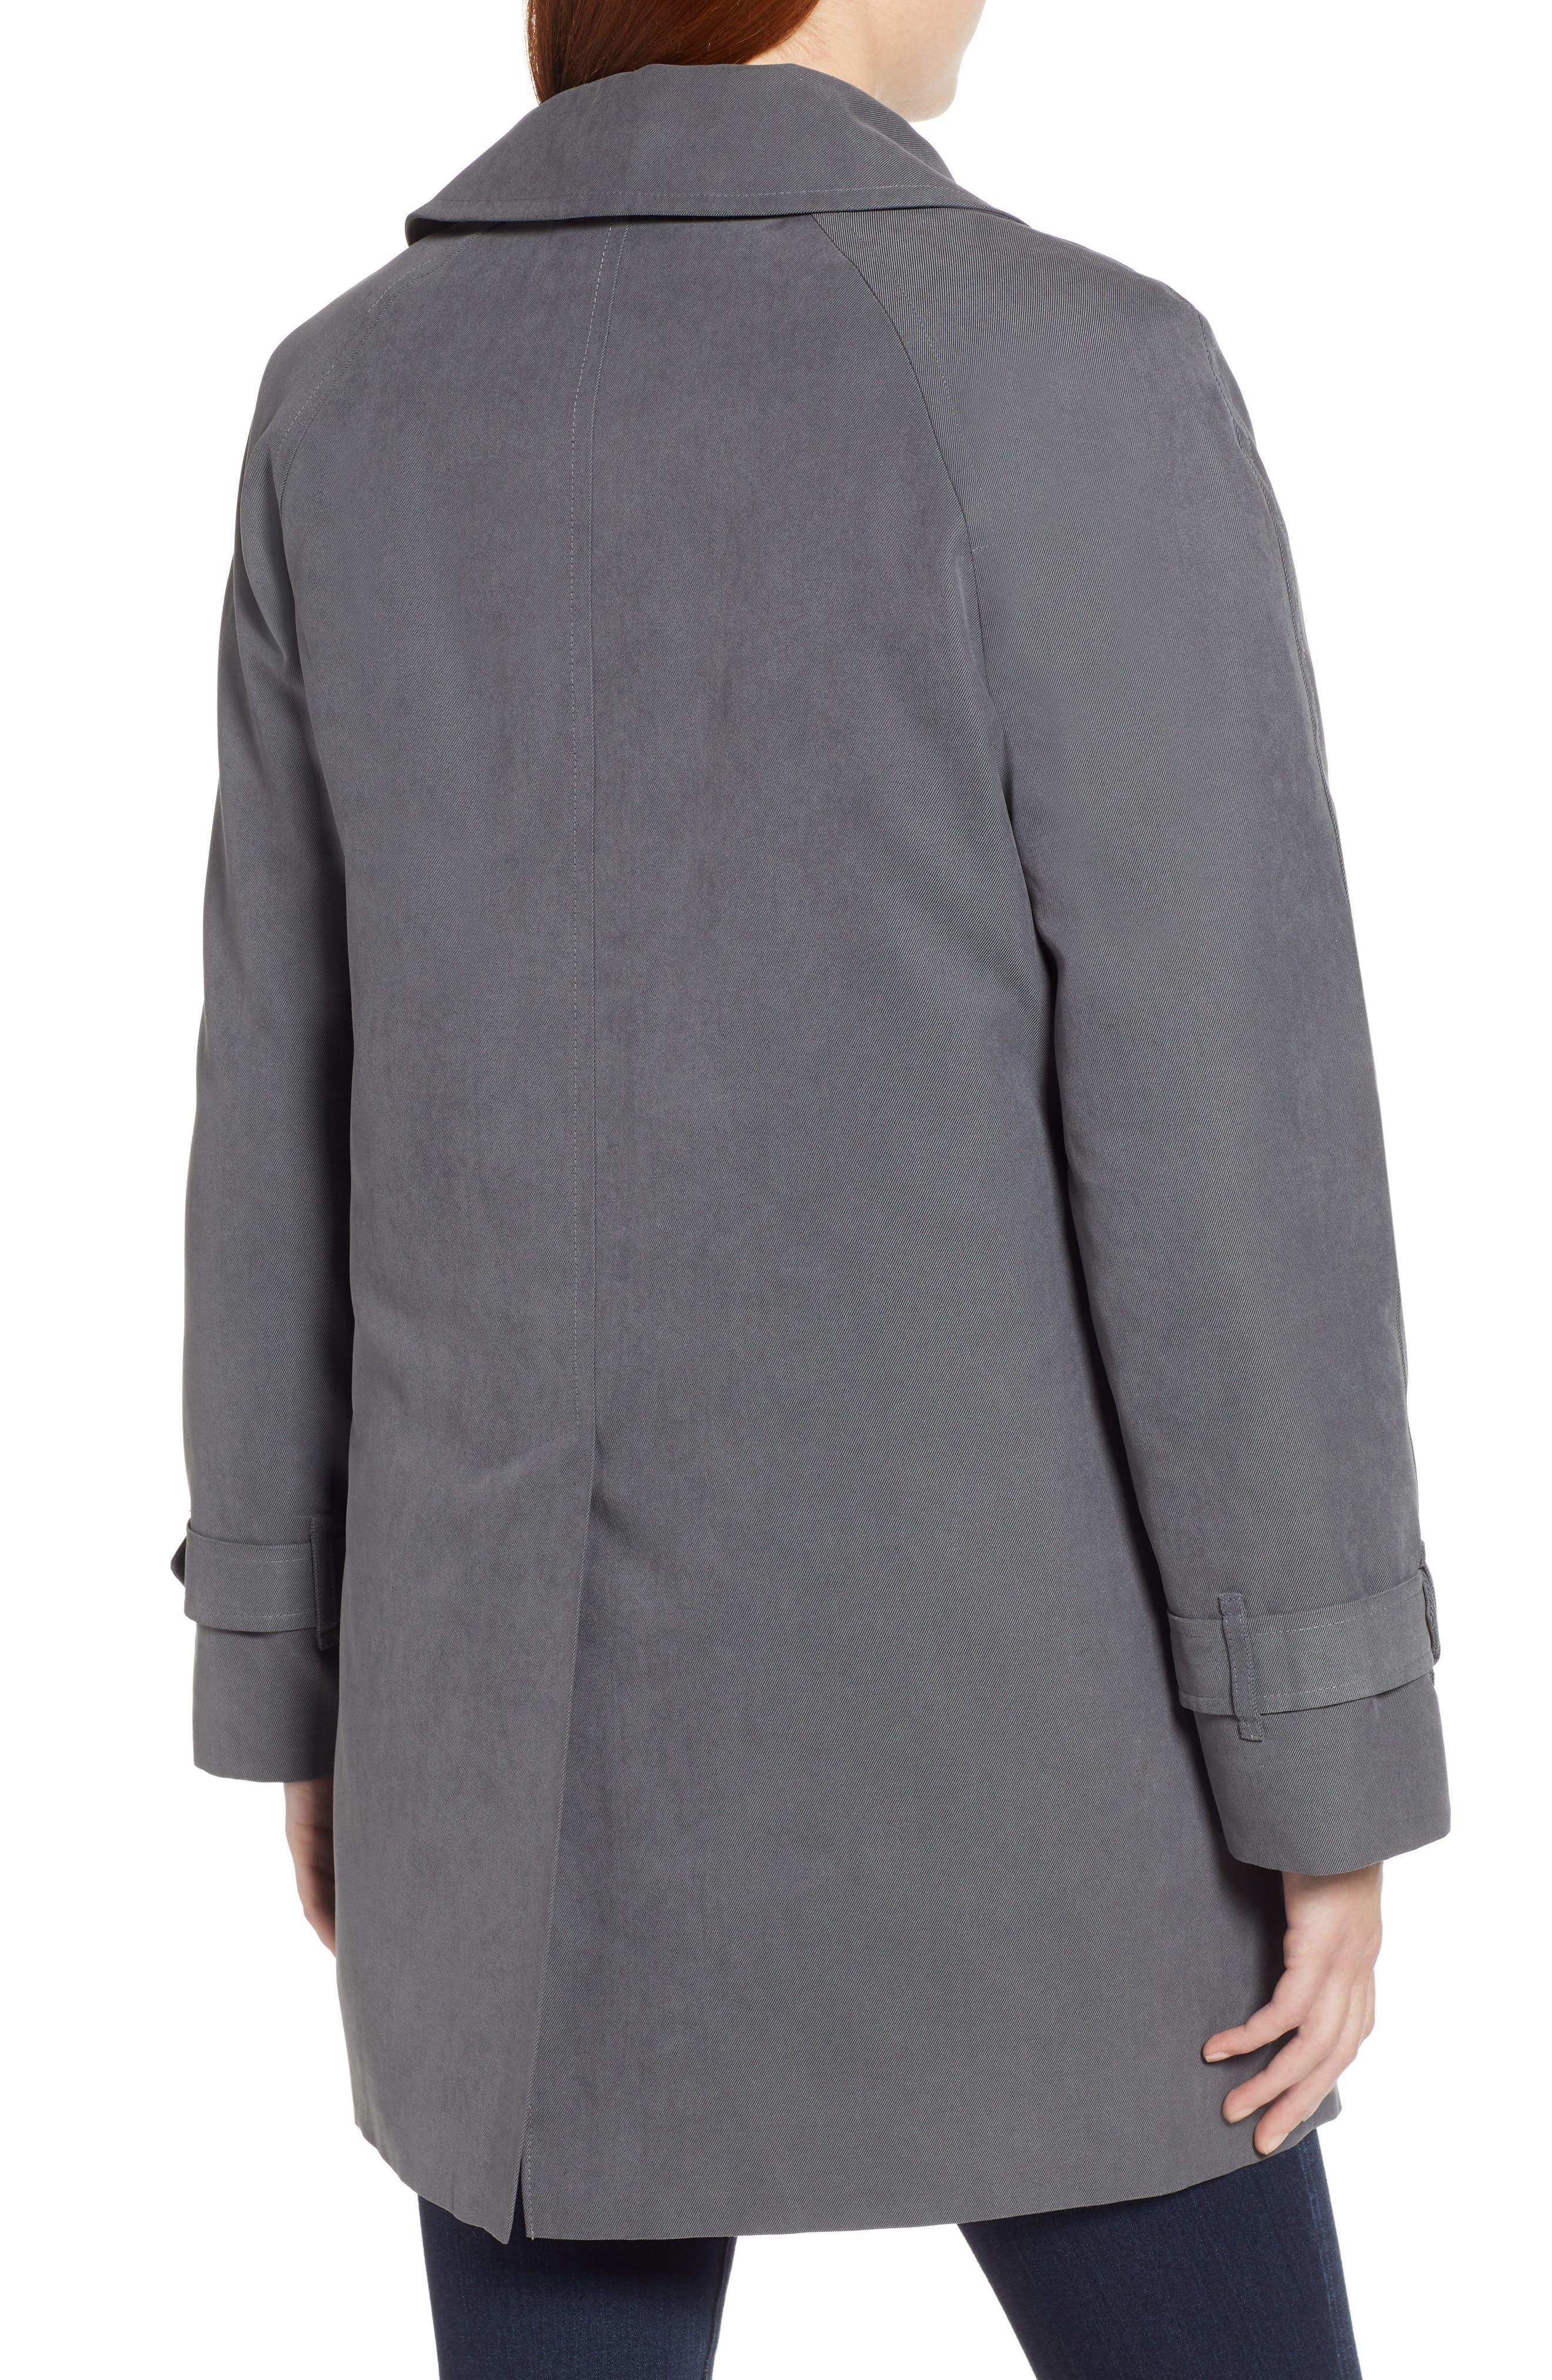 ae0afbf1f1 Women s London Fog Coats   Jackets